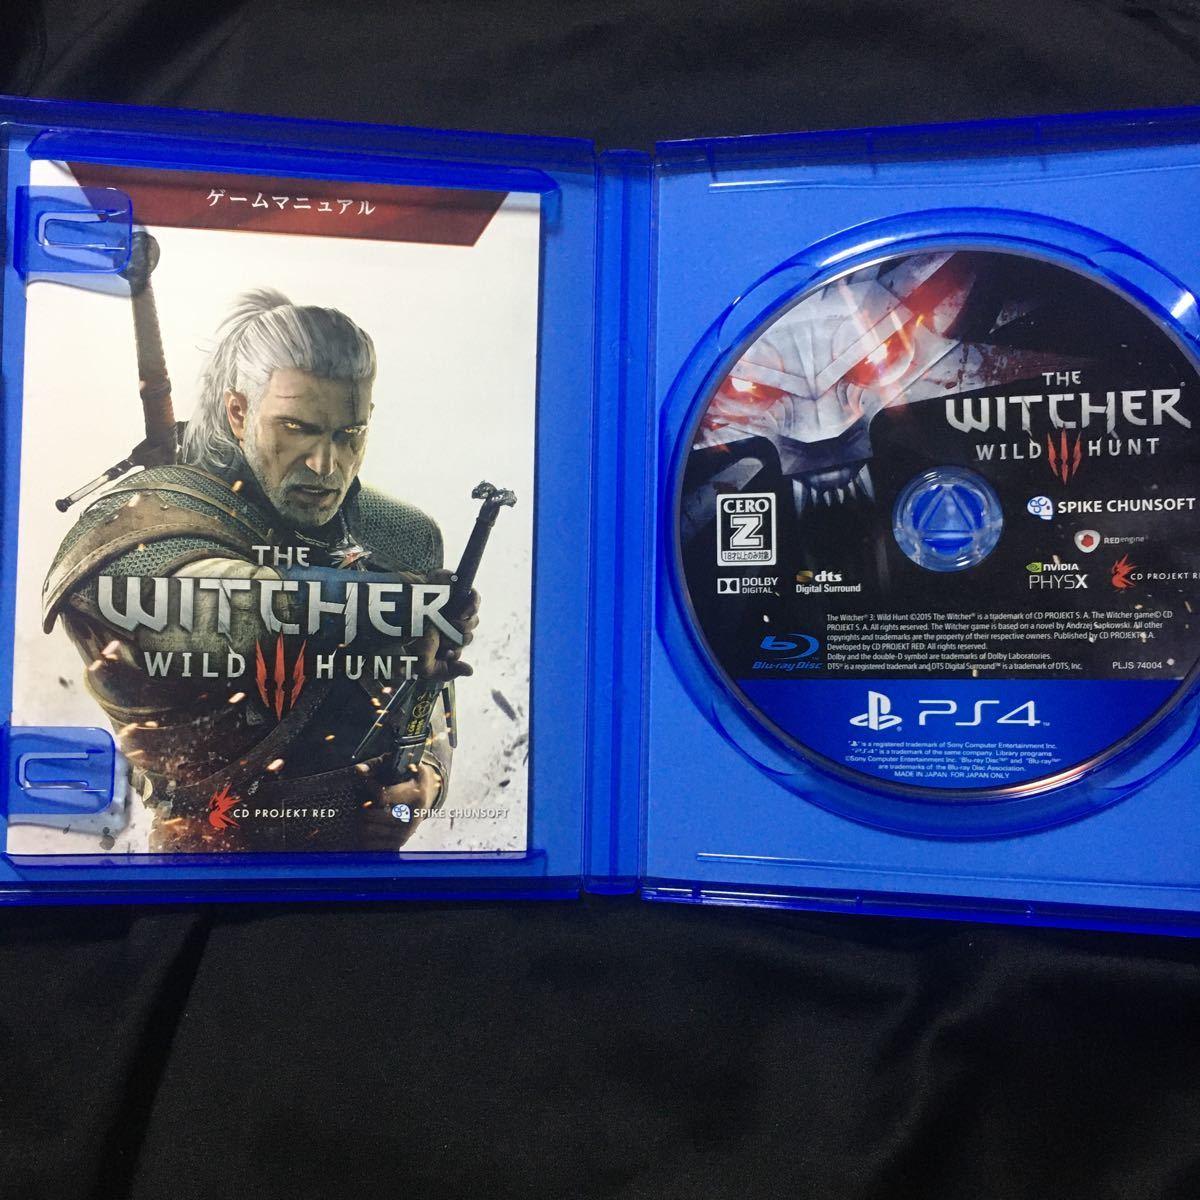 【PS4】 ウィッチャー3 ワイルドハント [通常版]送料無料、匿名配送、当日発送可能♪